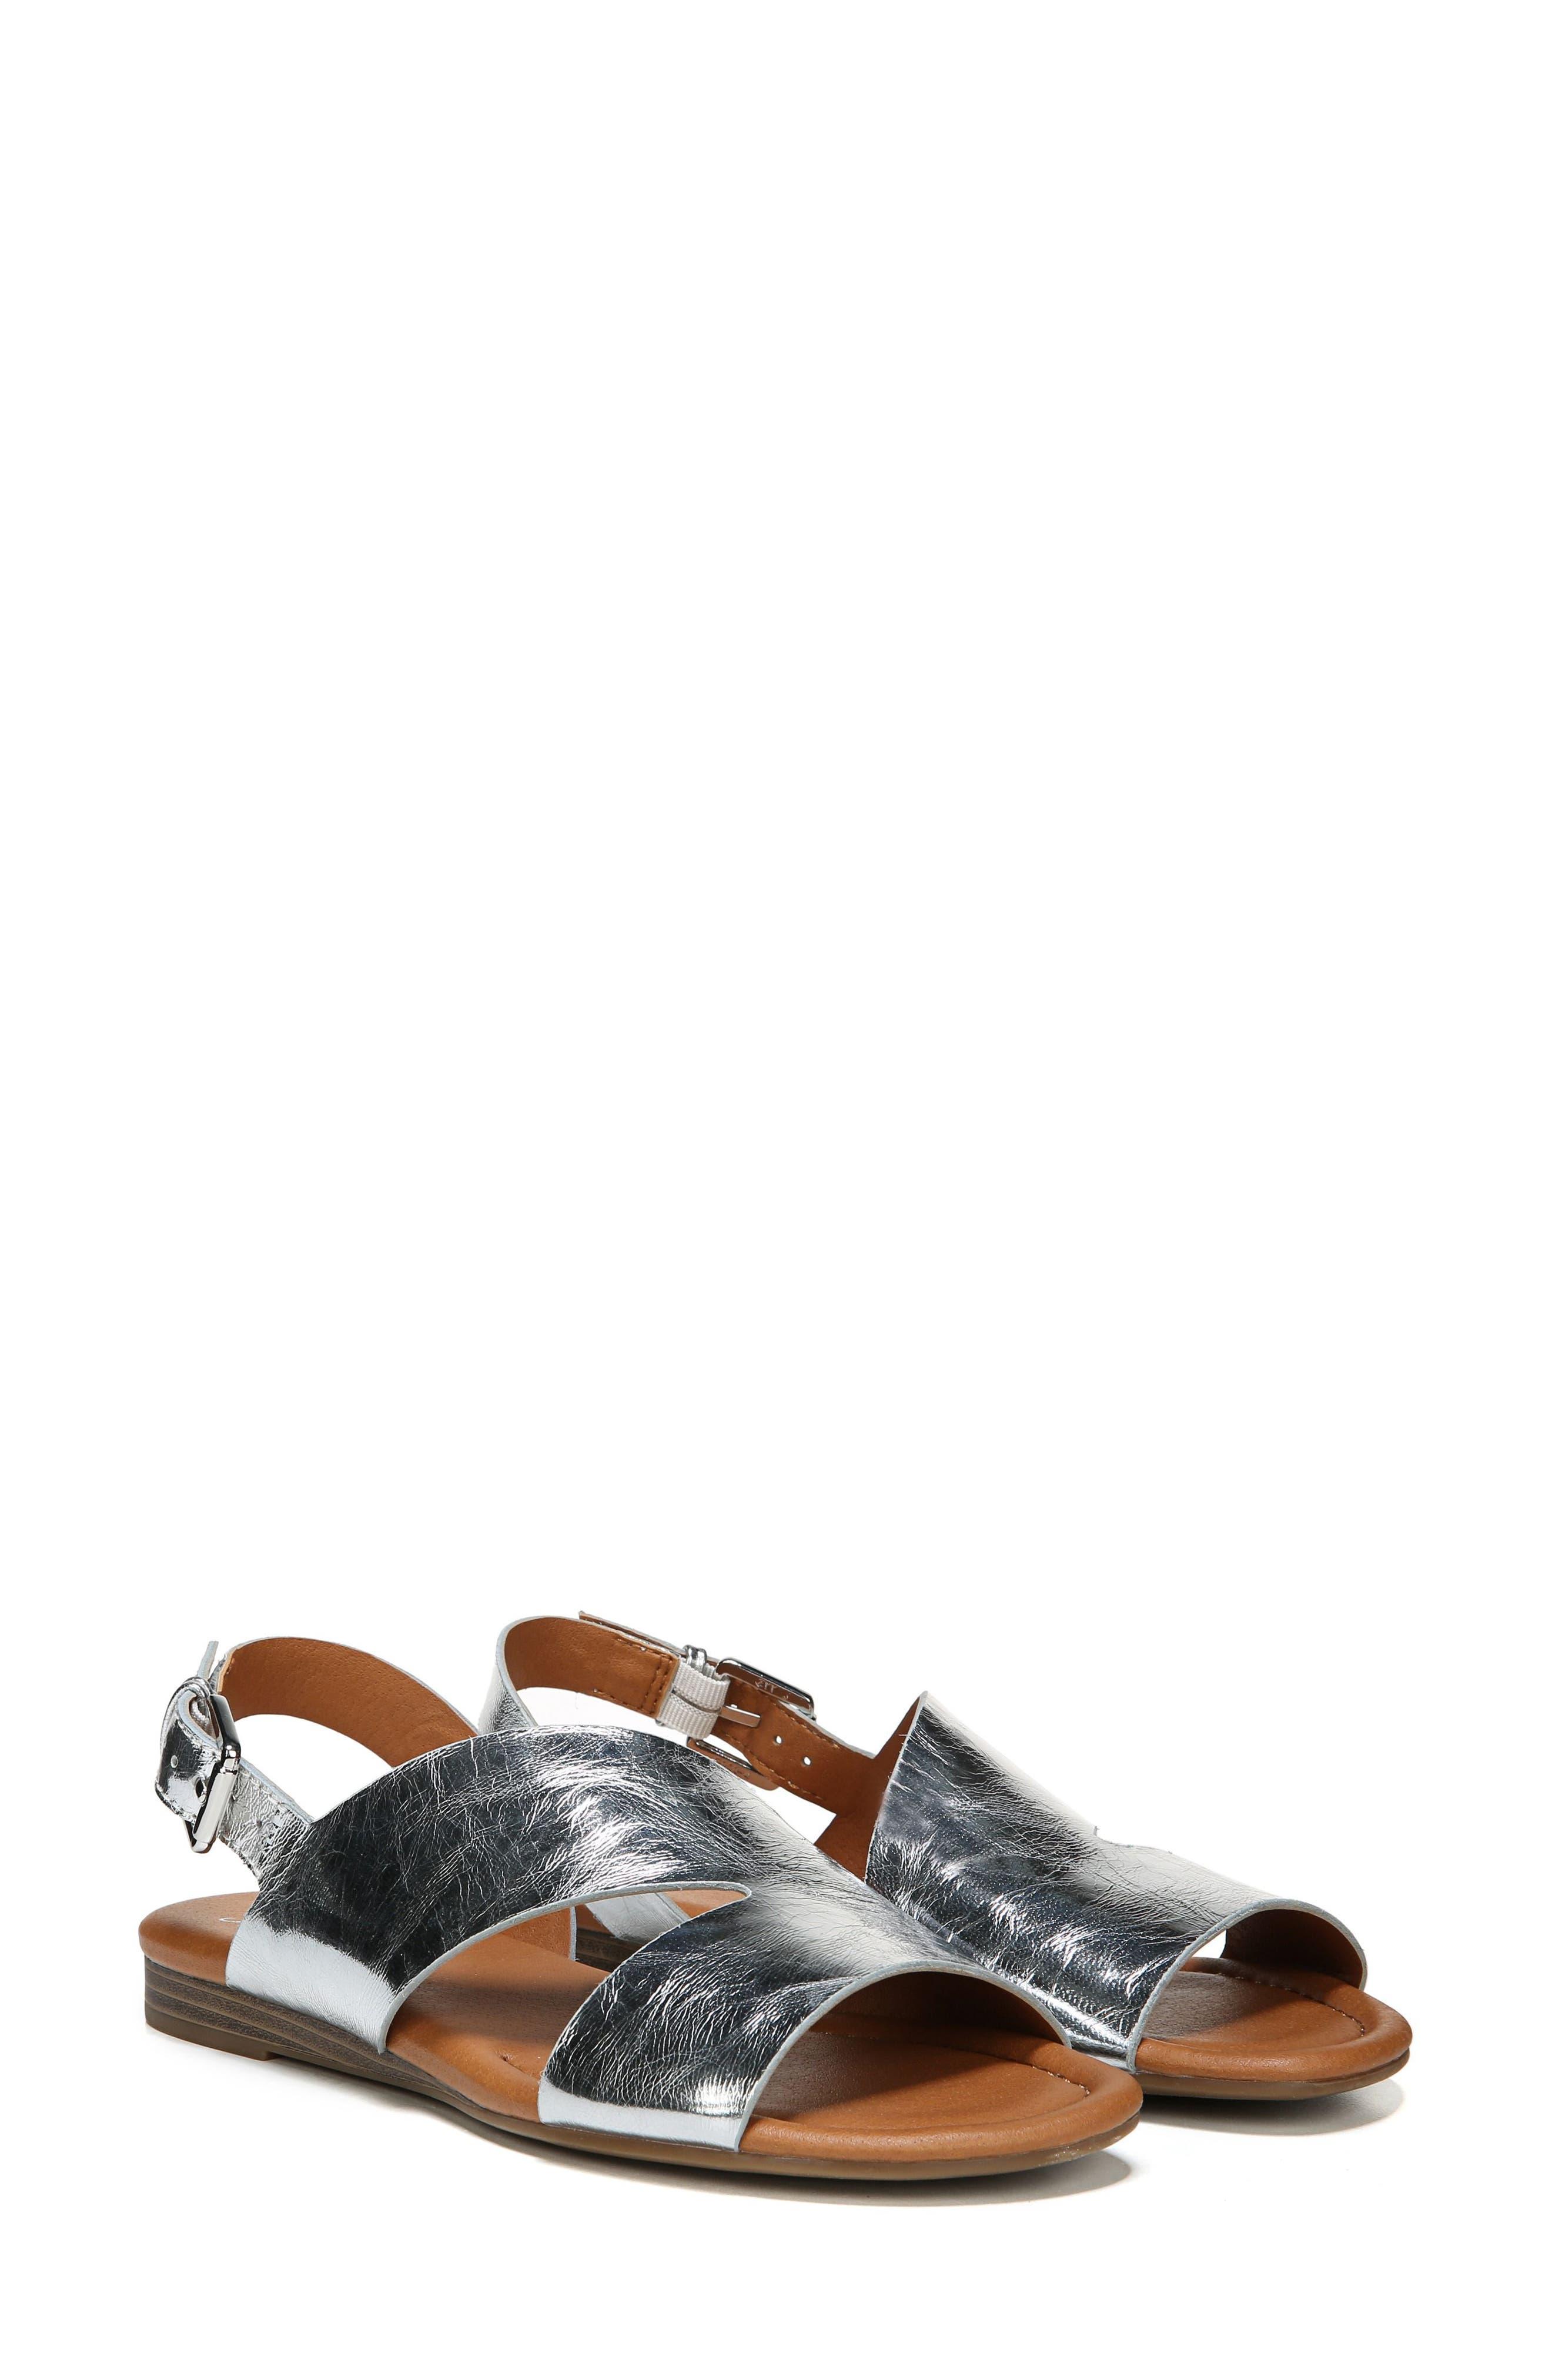 Garza Slingback Sandal,                             Alternate thumbnail 8, color,                             ARGENTO LEATHER